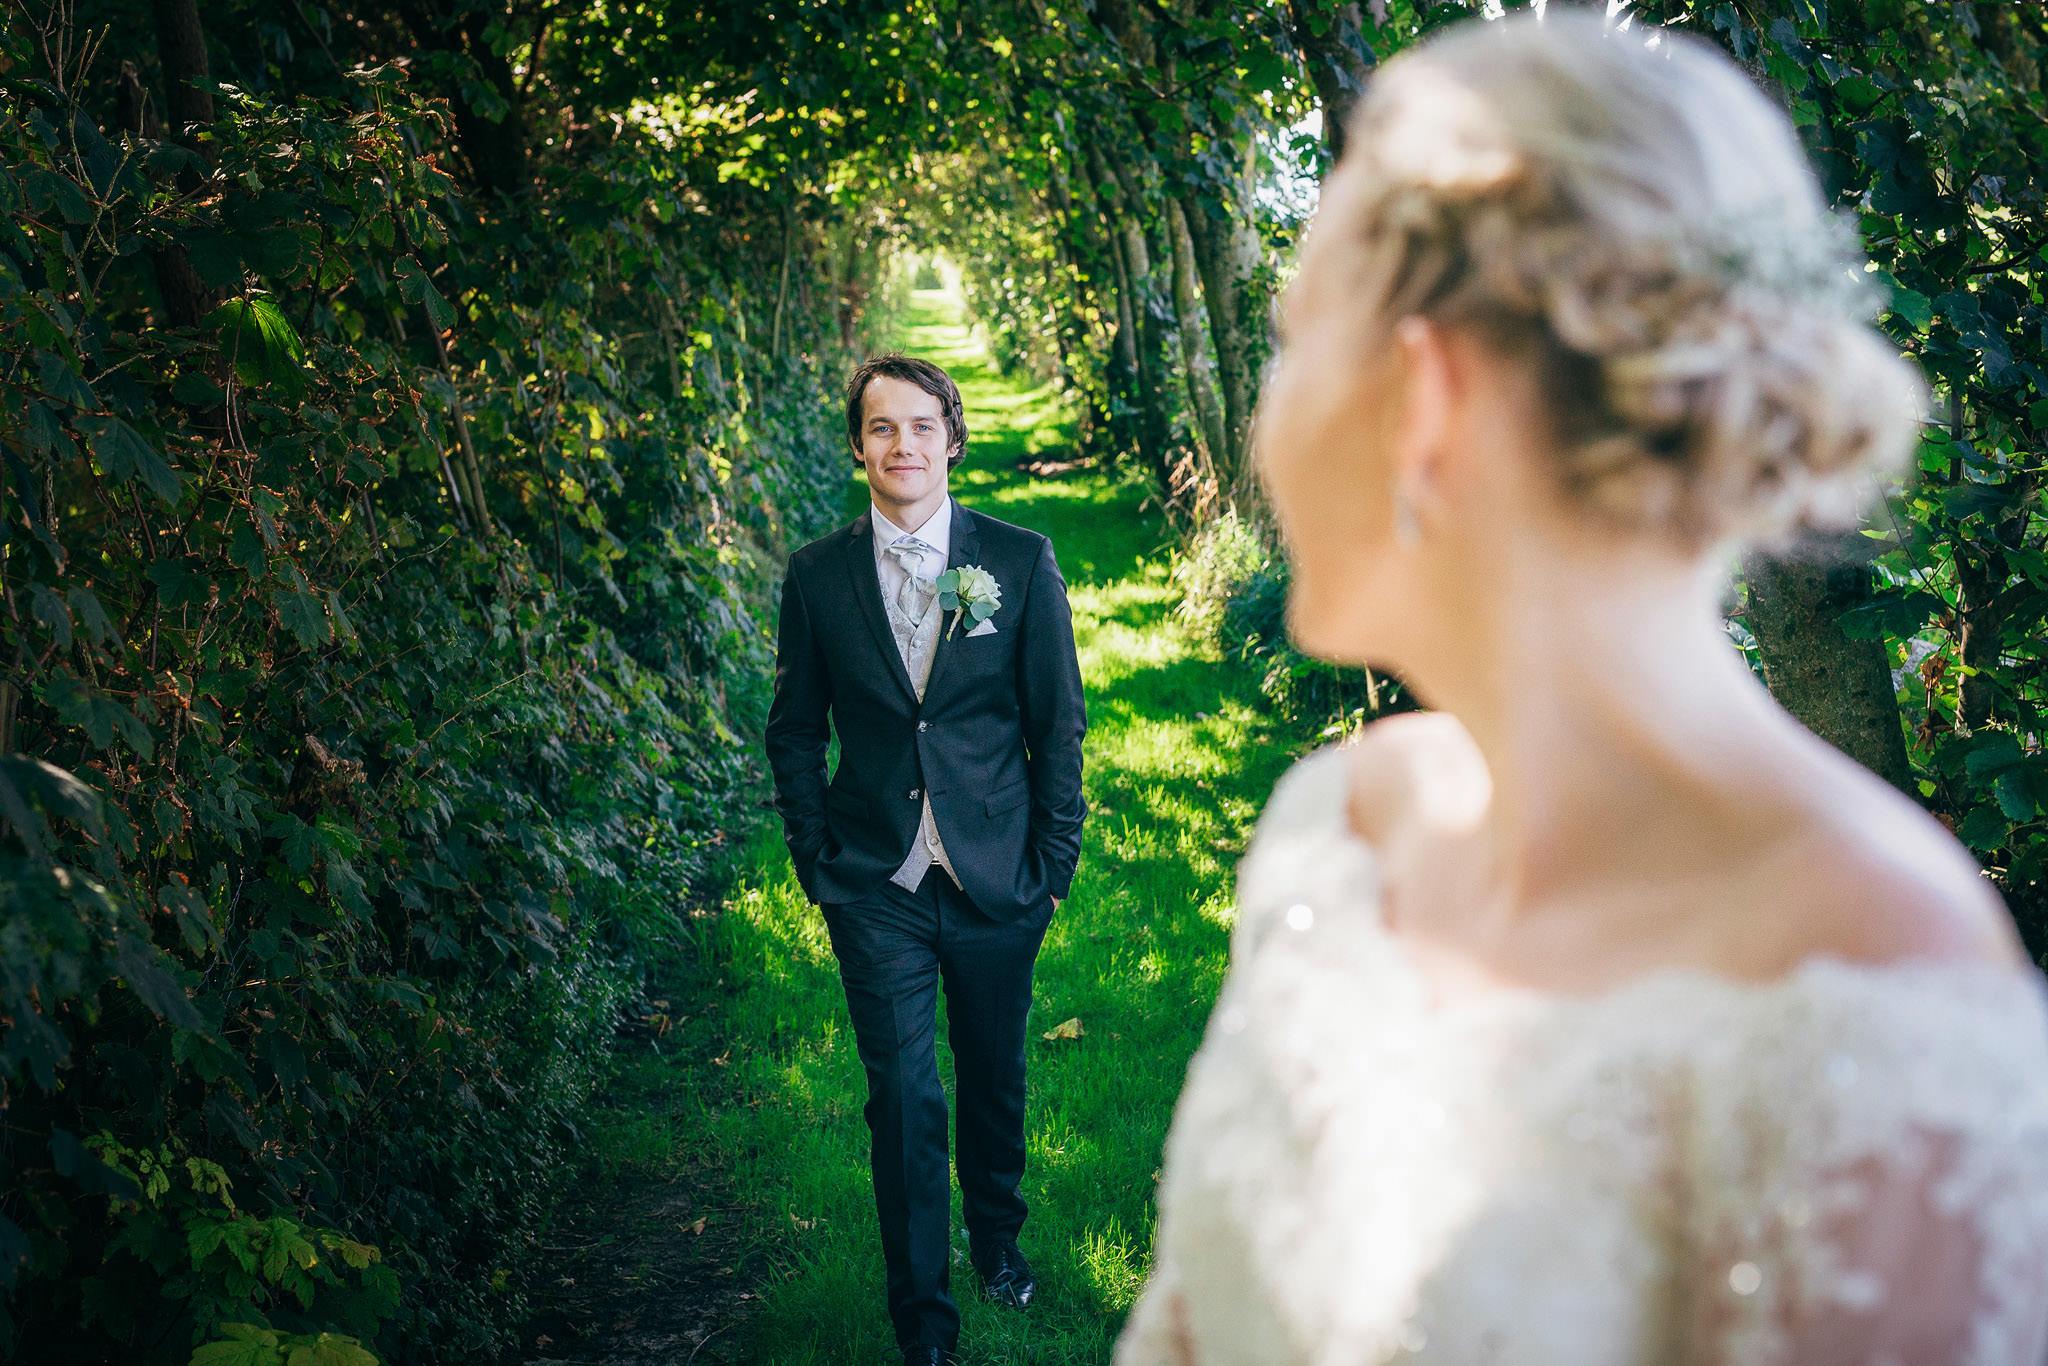 Wedding+Photographer+Norway+Bryllupsfotograf+Casey+Arneson+JT-99.jpg